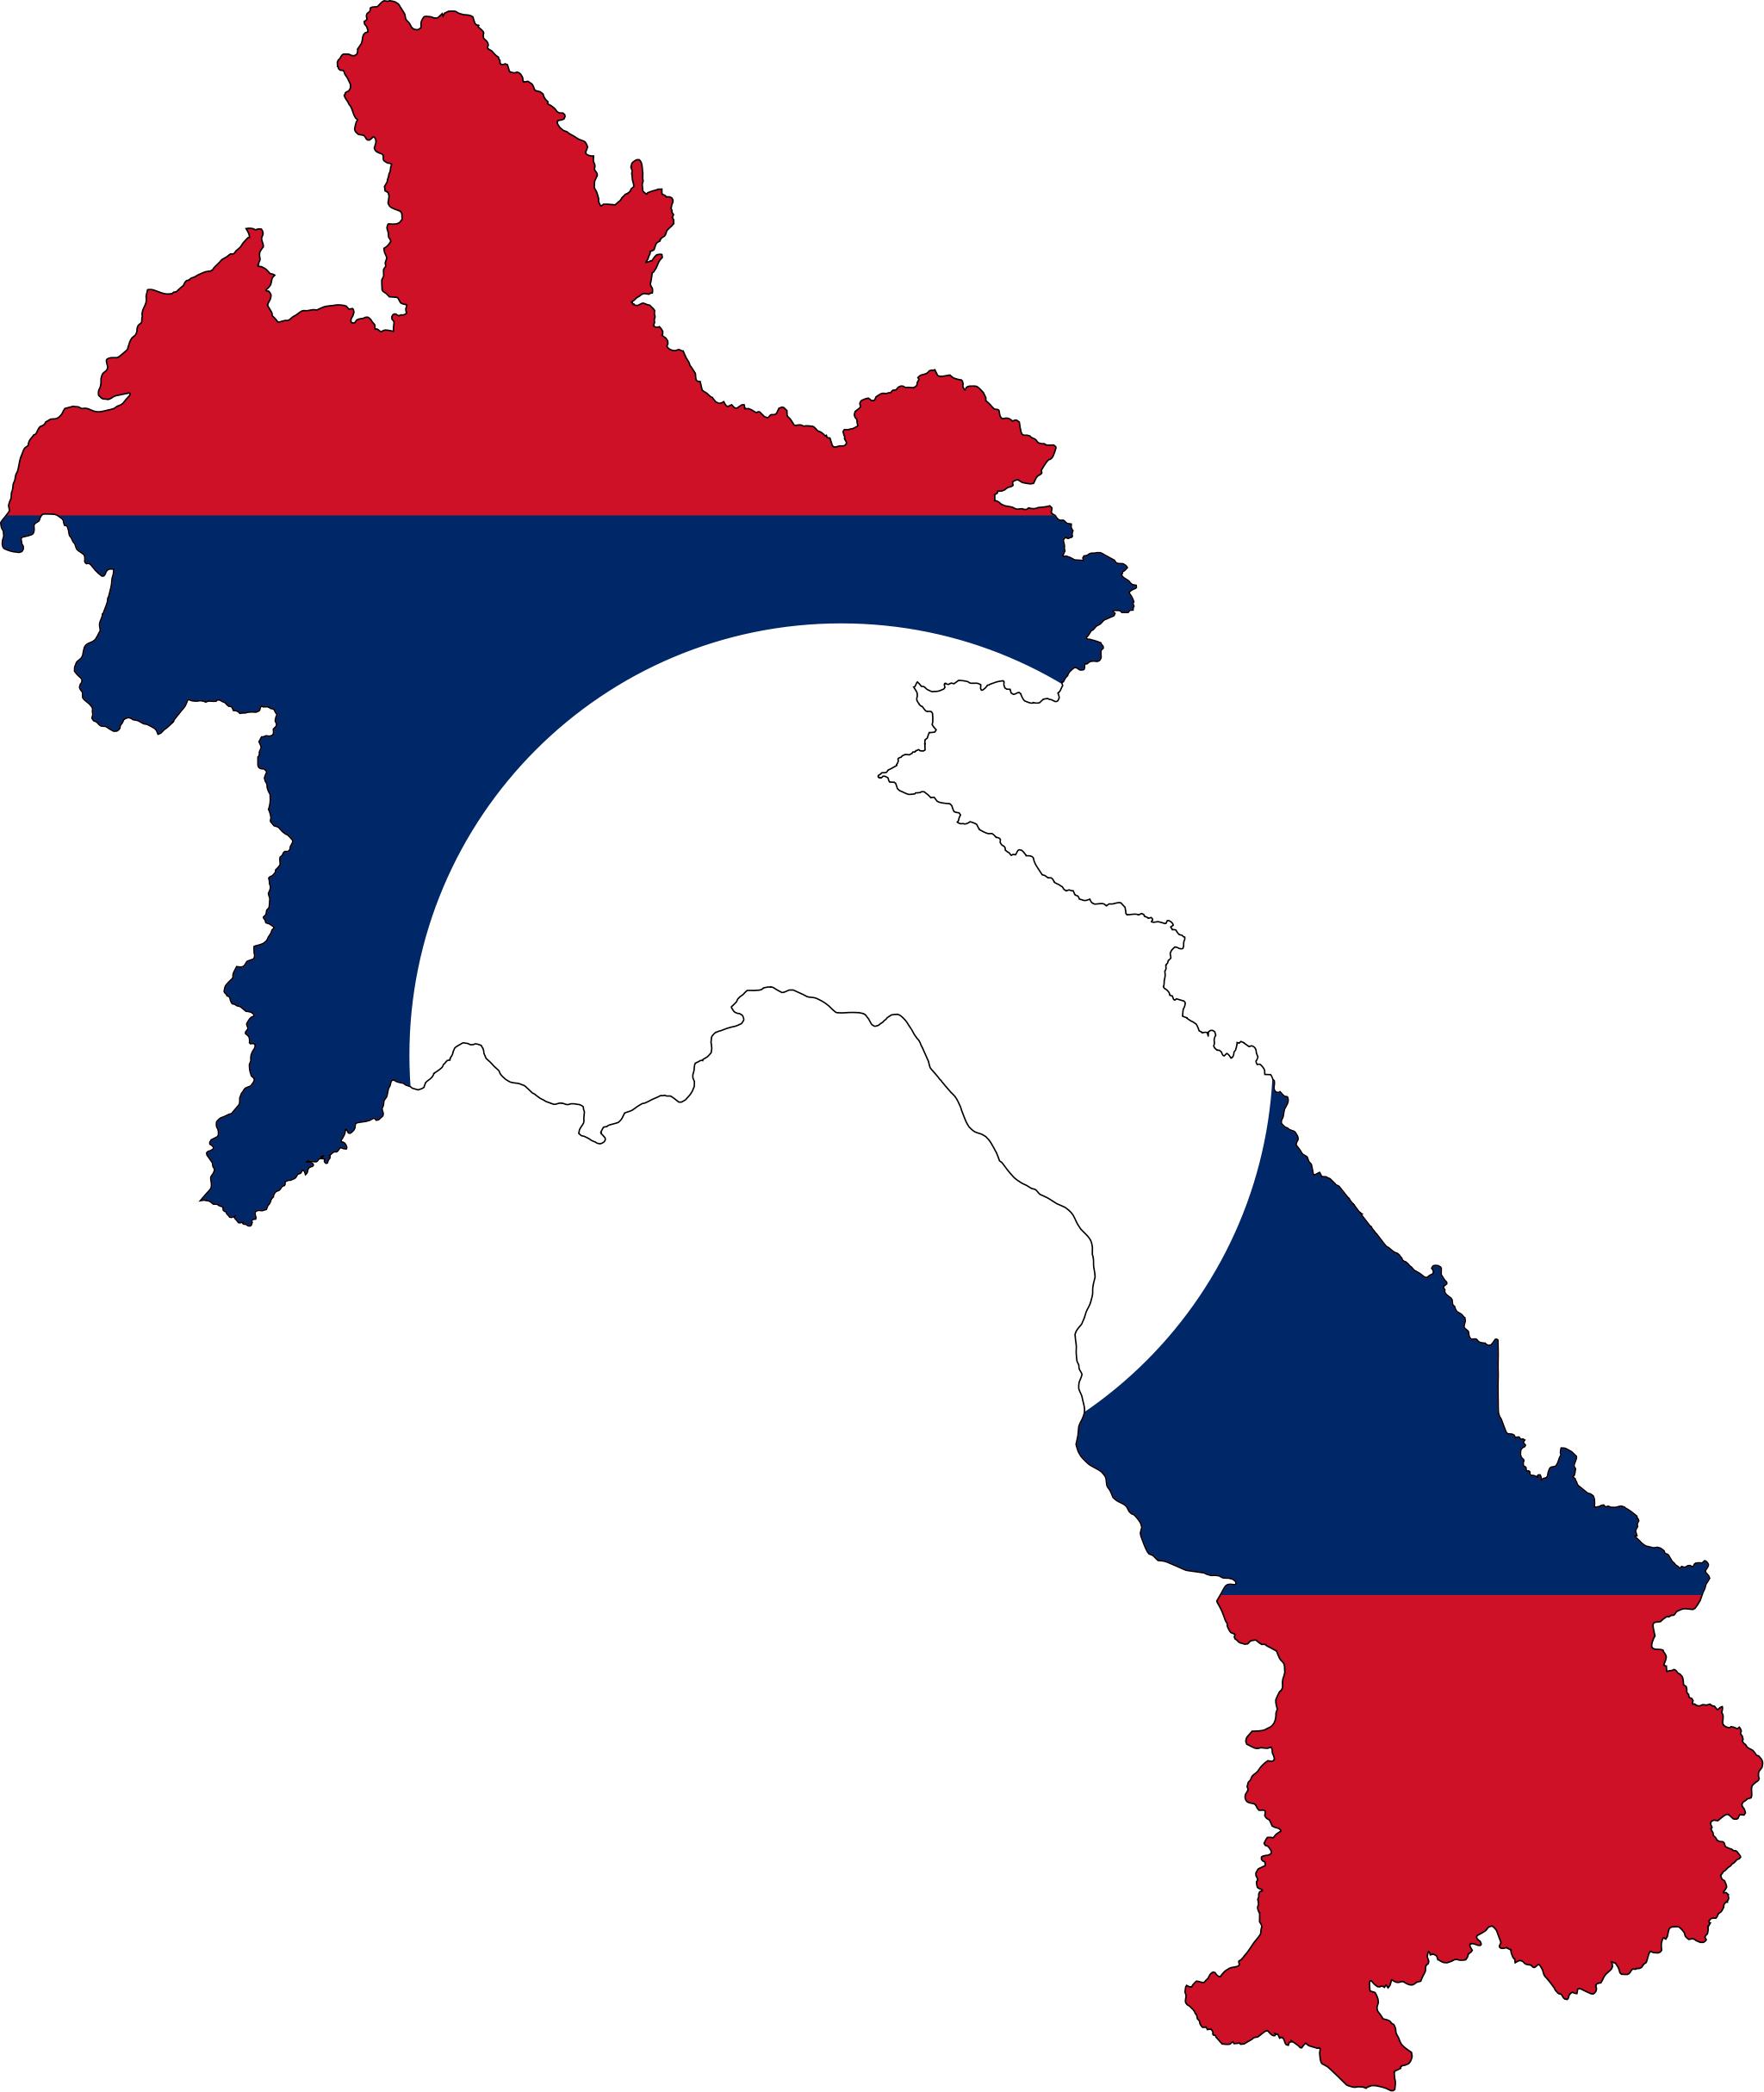 Carte Du Monde Laos.Pin By Ben Stradley On Fun W Flags Vexillology Pinterest